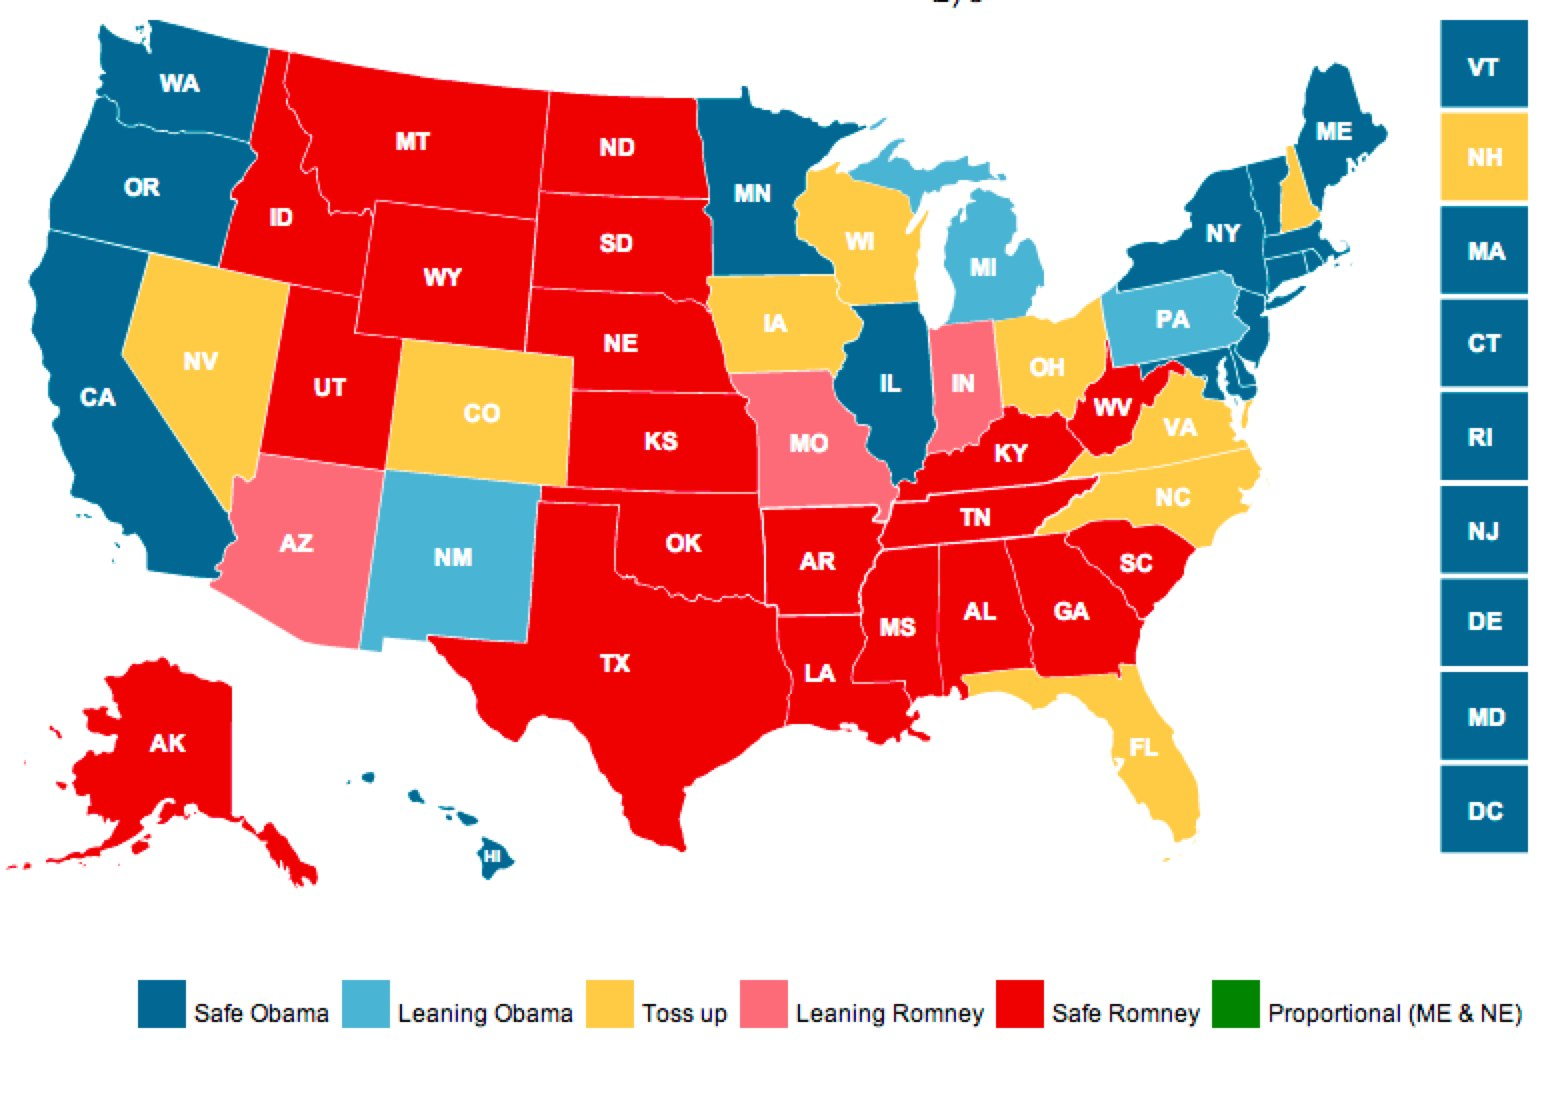 CNN 2012 Electoral Map